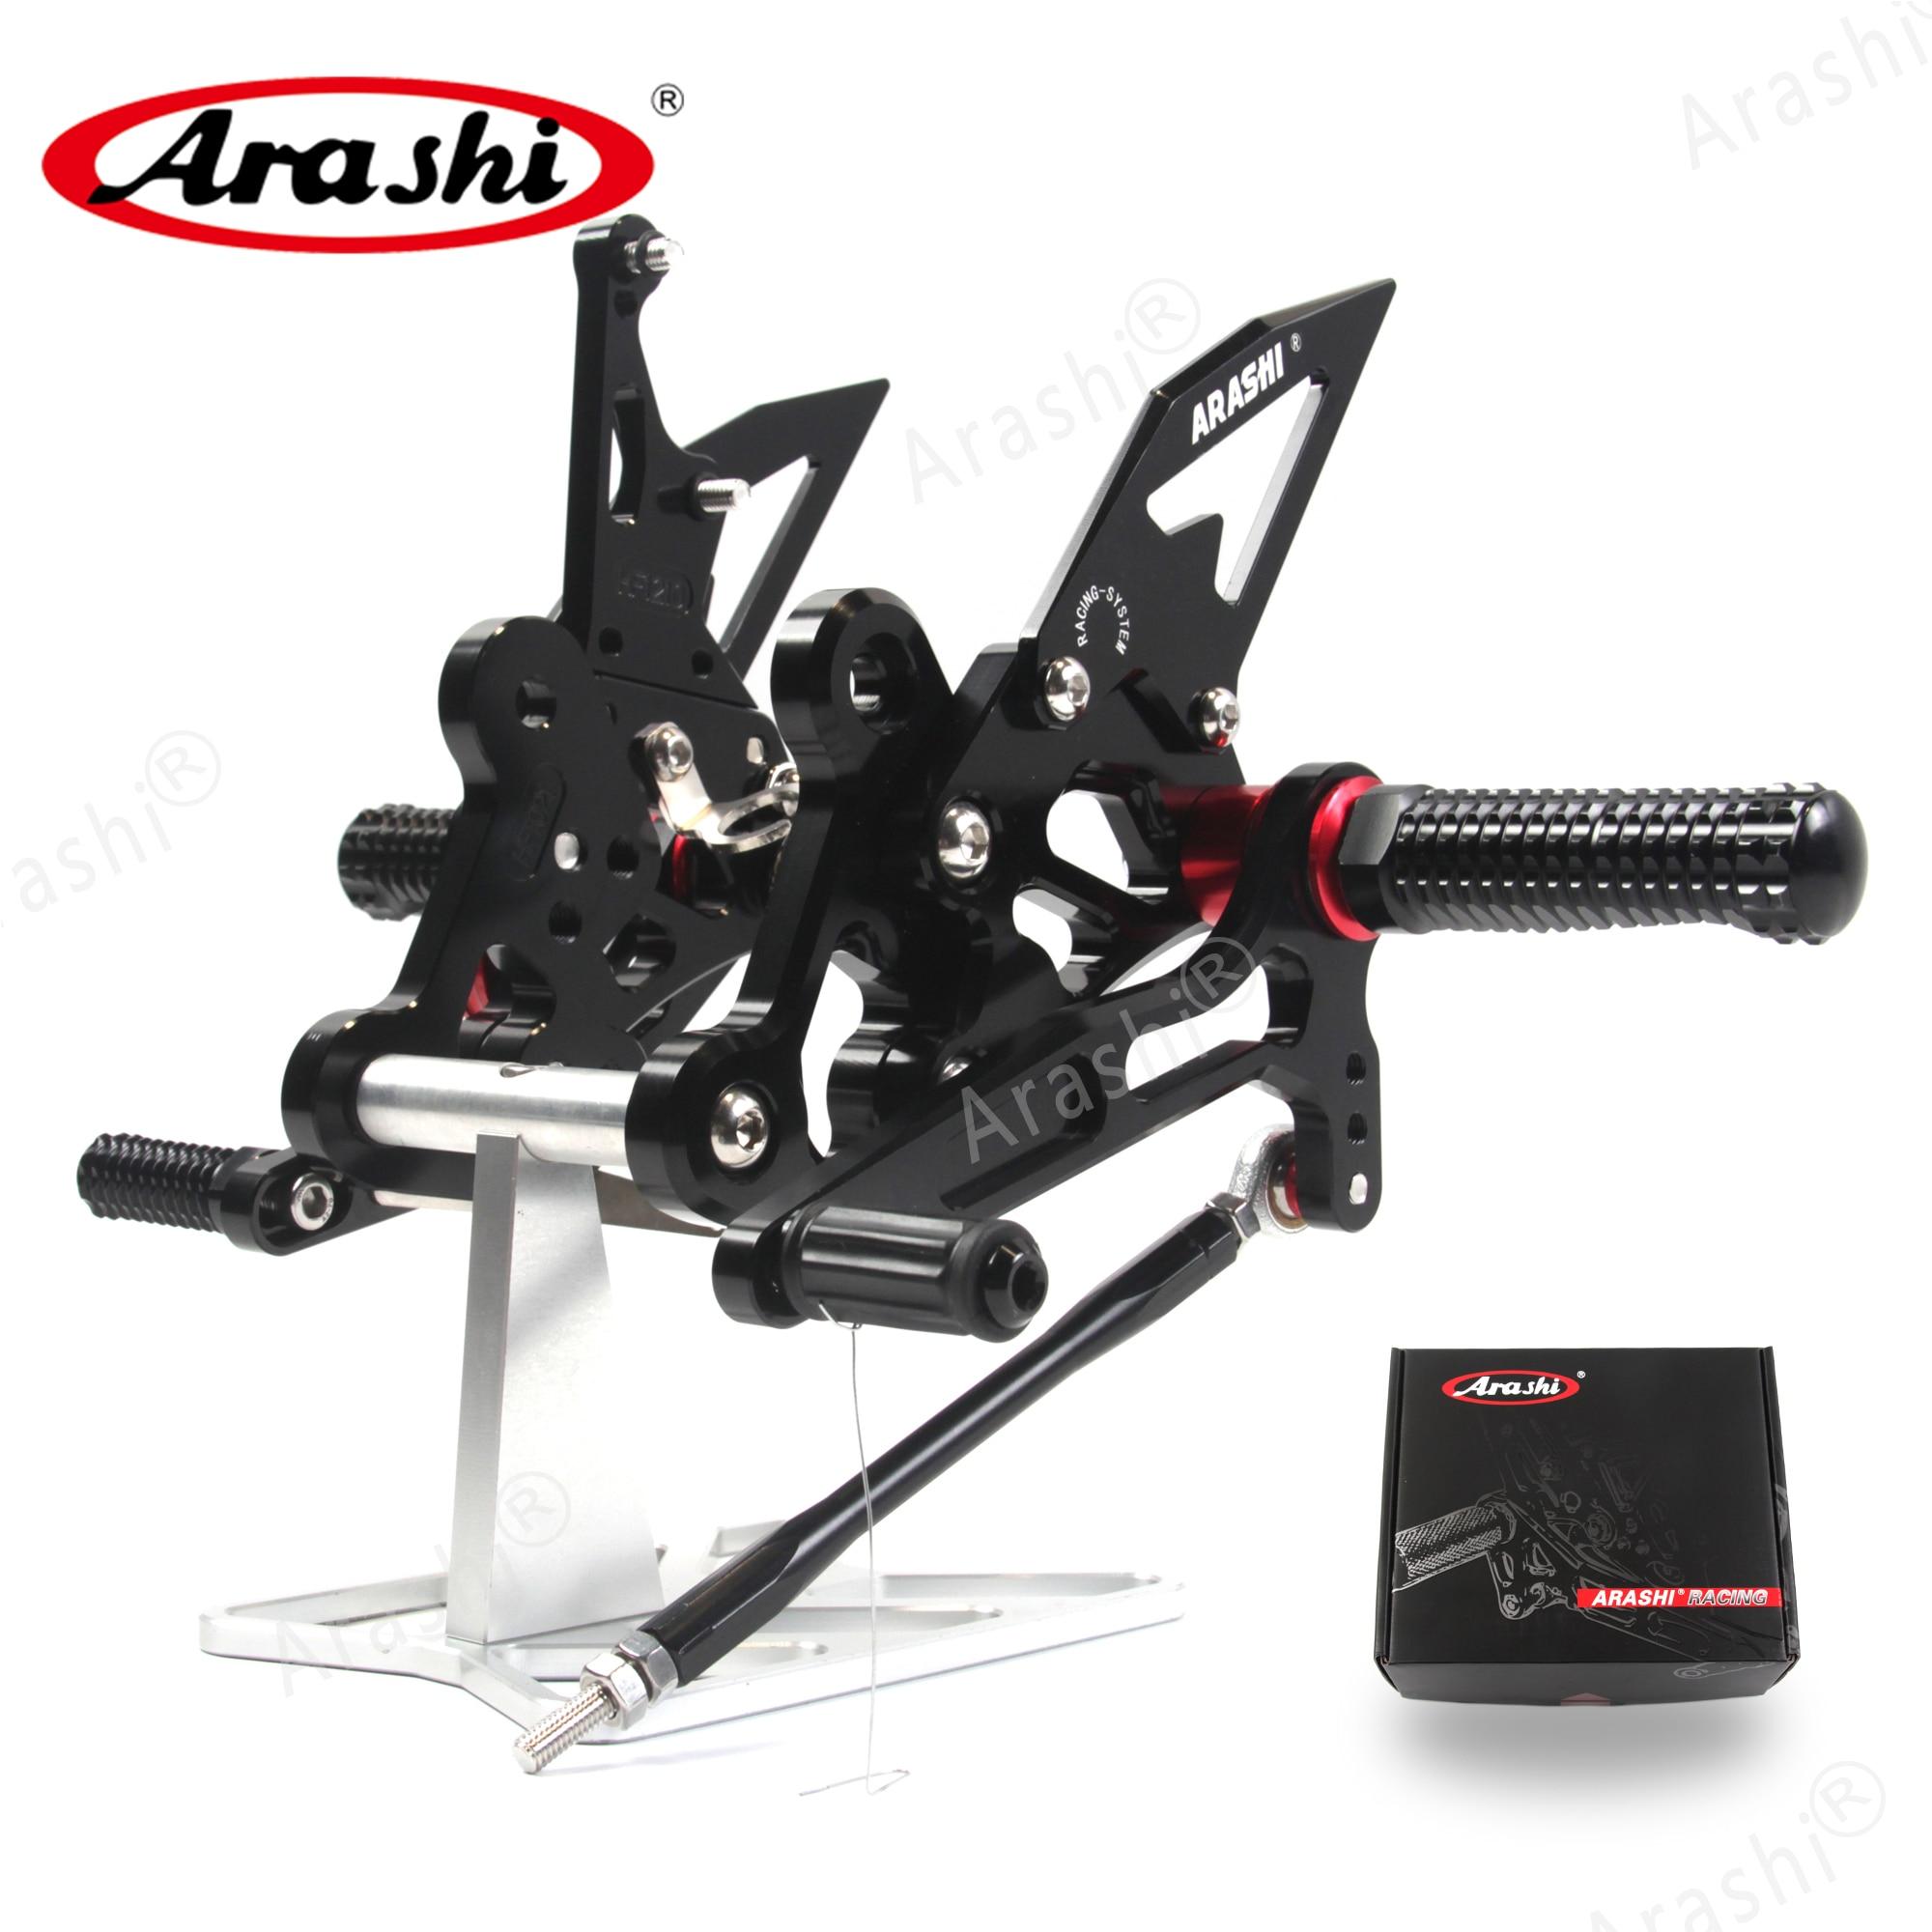 Arashi Motorcycle Adjustable Footrests For SUZUKI GSX-S750 2015-2017 CNC Foot Pegs GSXS750 GSXS GSX S 750 GSX750S 2015 2016 2017